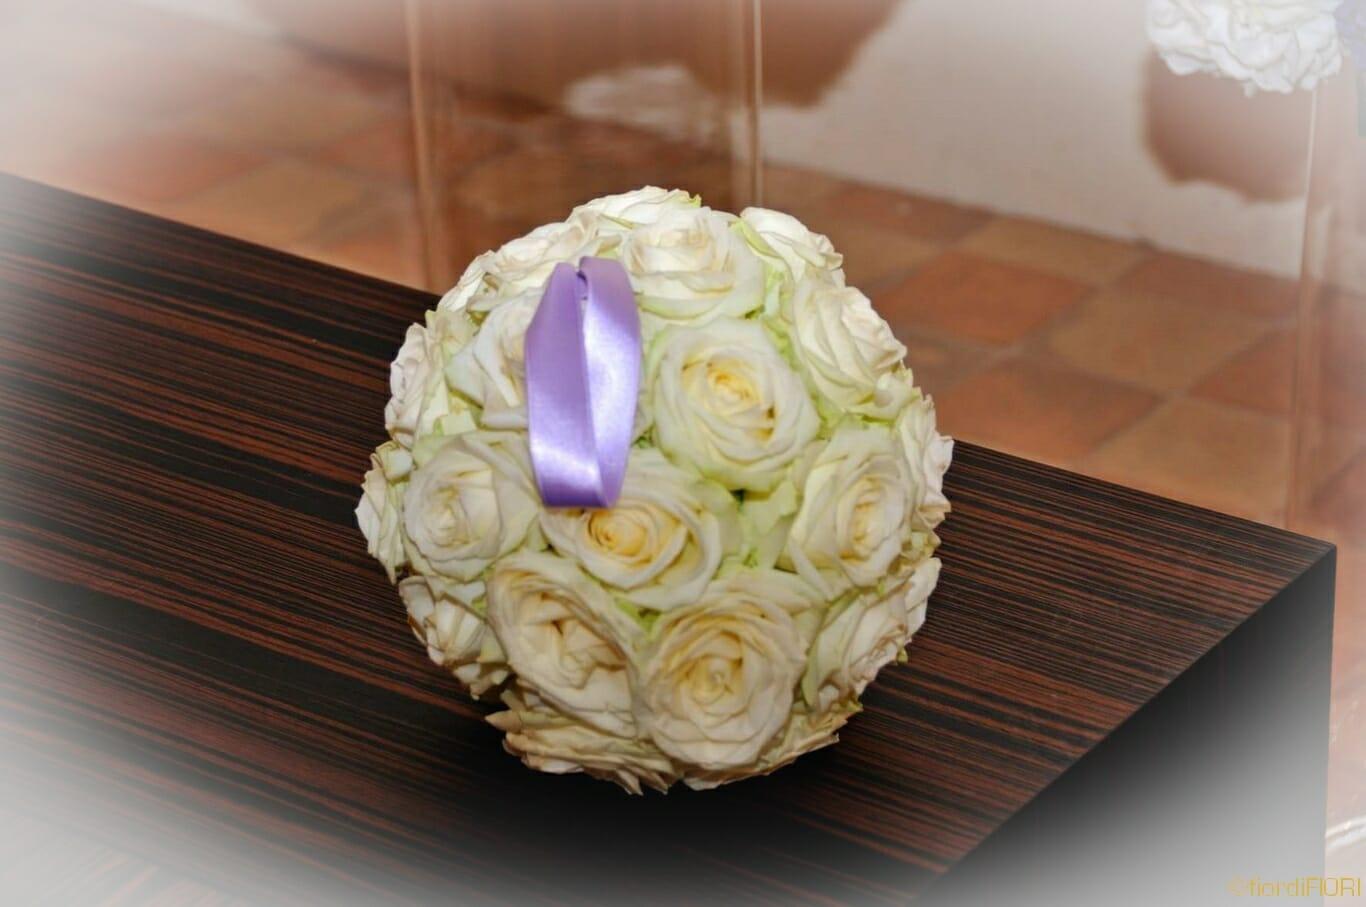 Bouquet tondo con rose